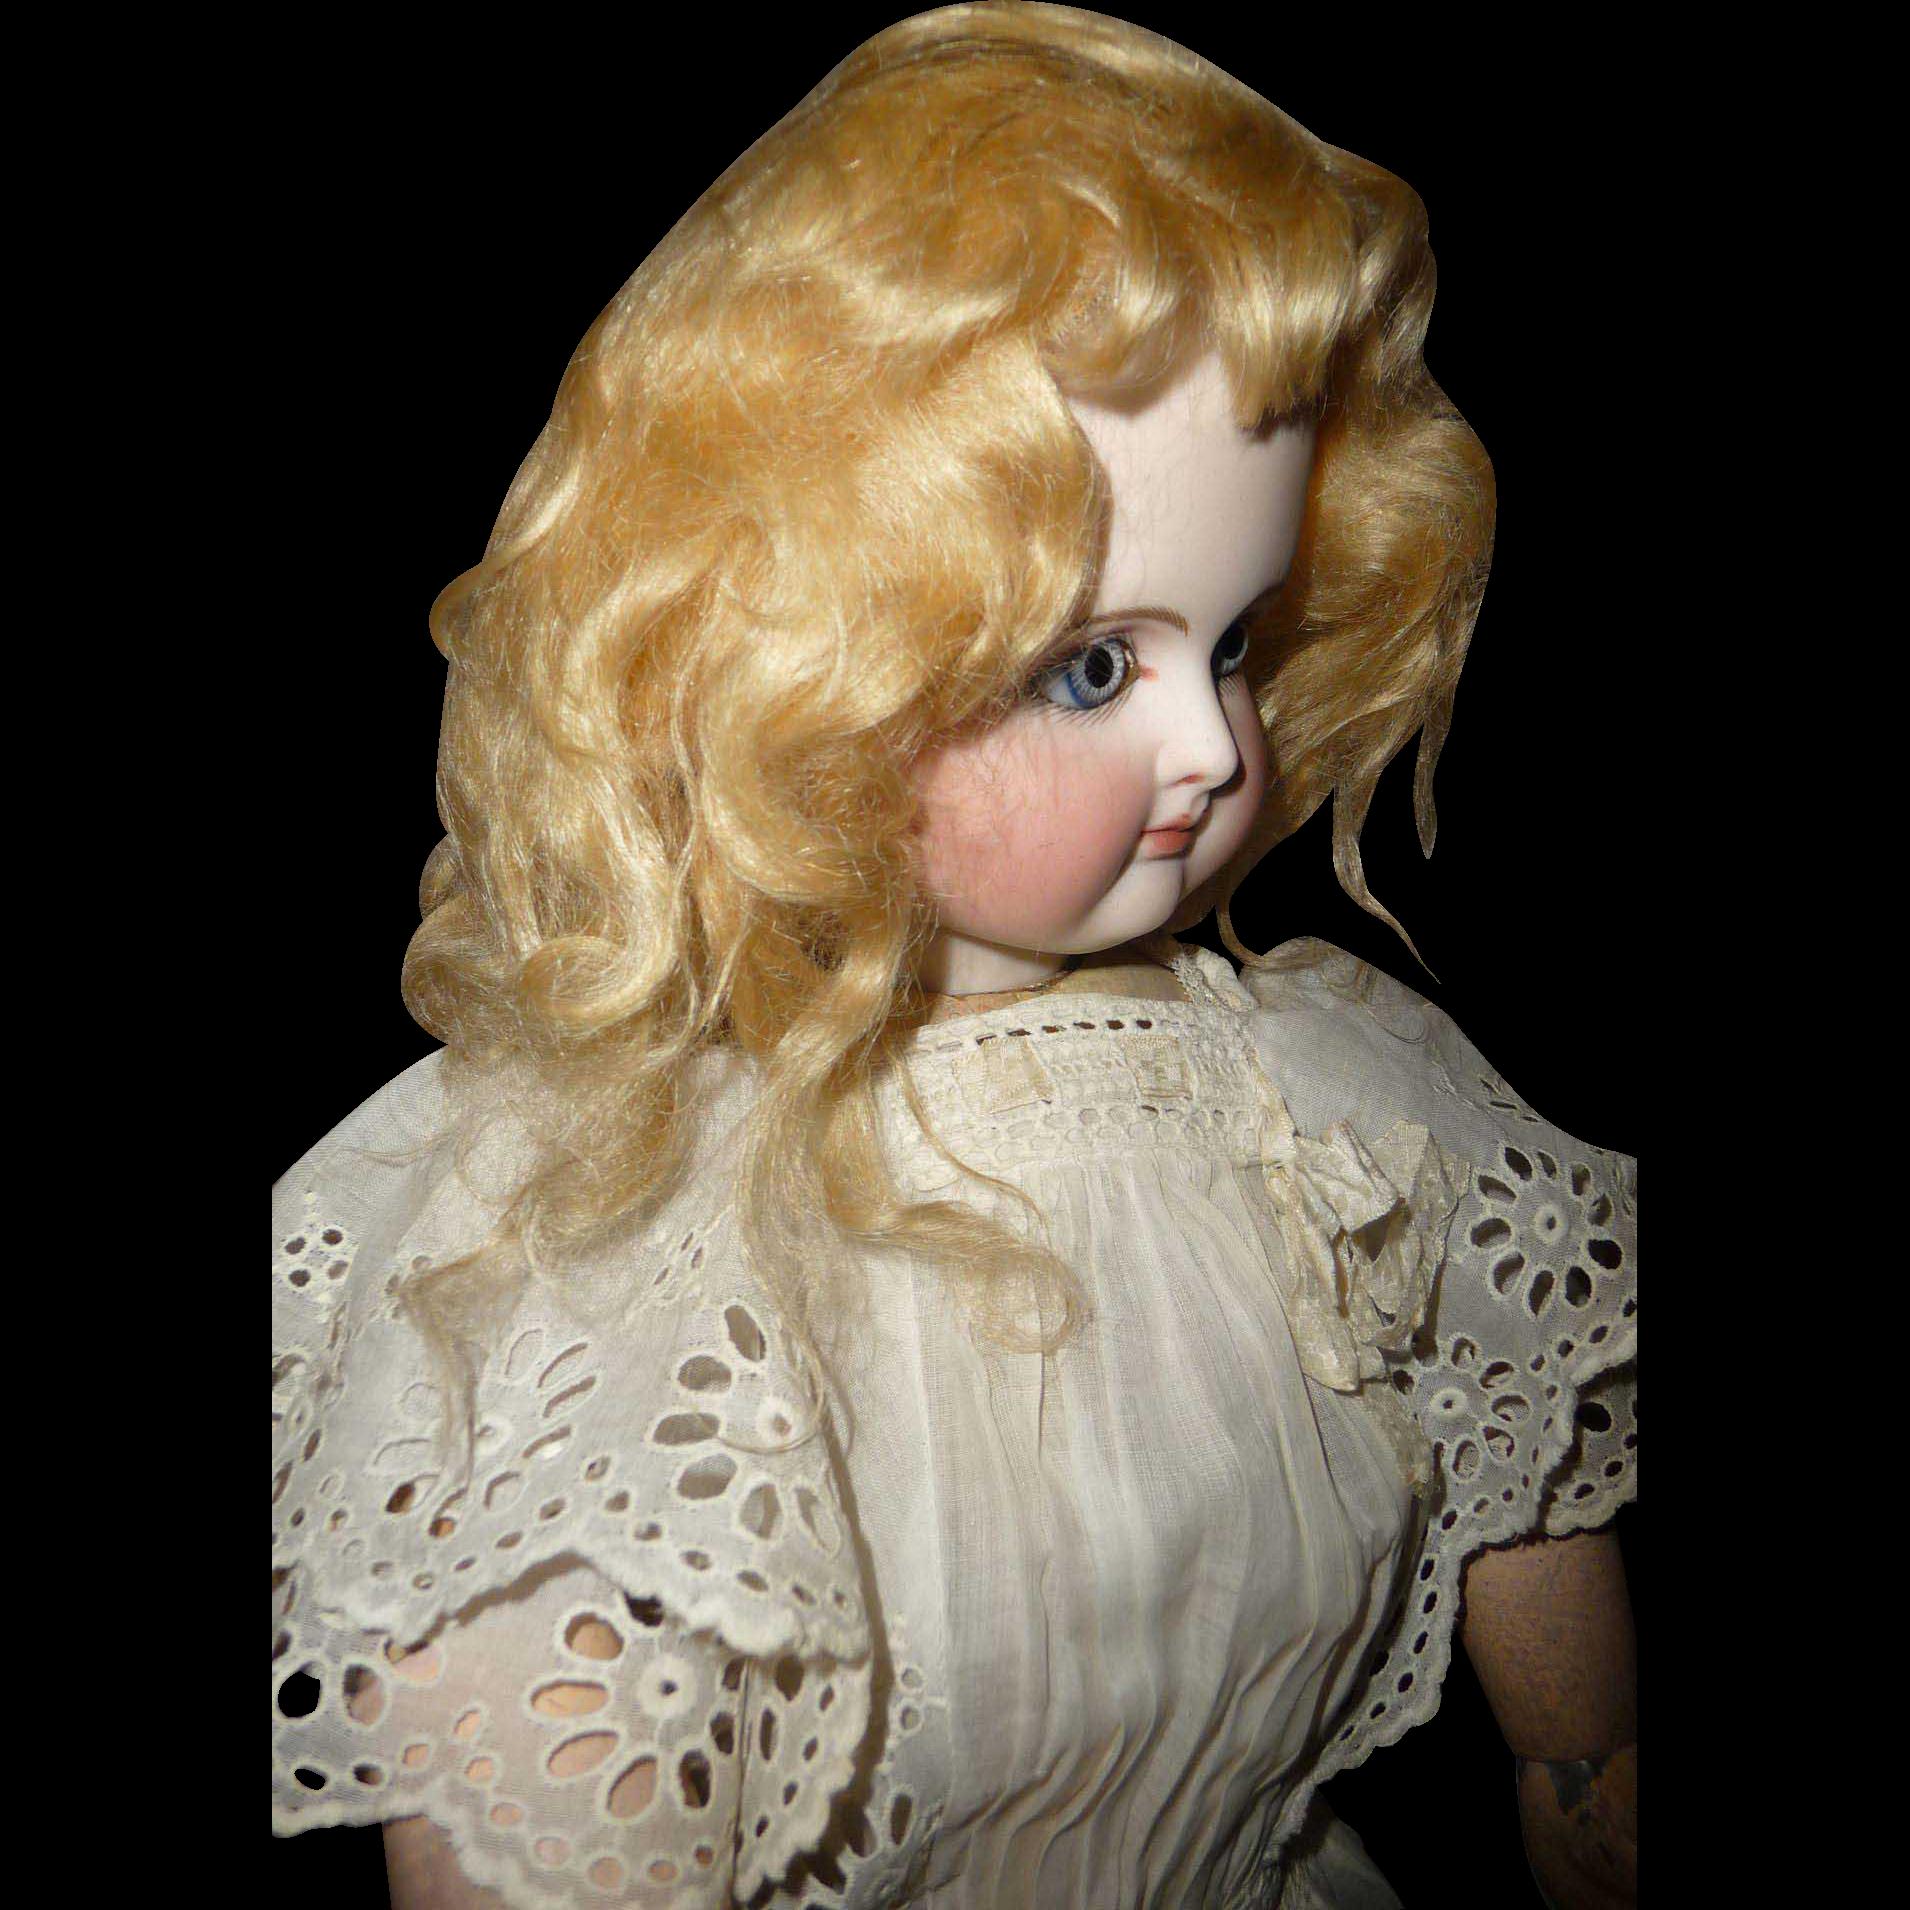 Antique golden blond doll wig